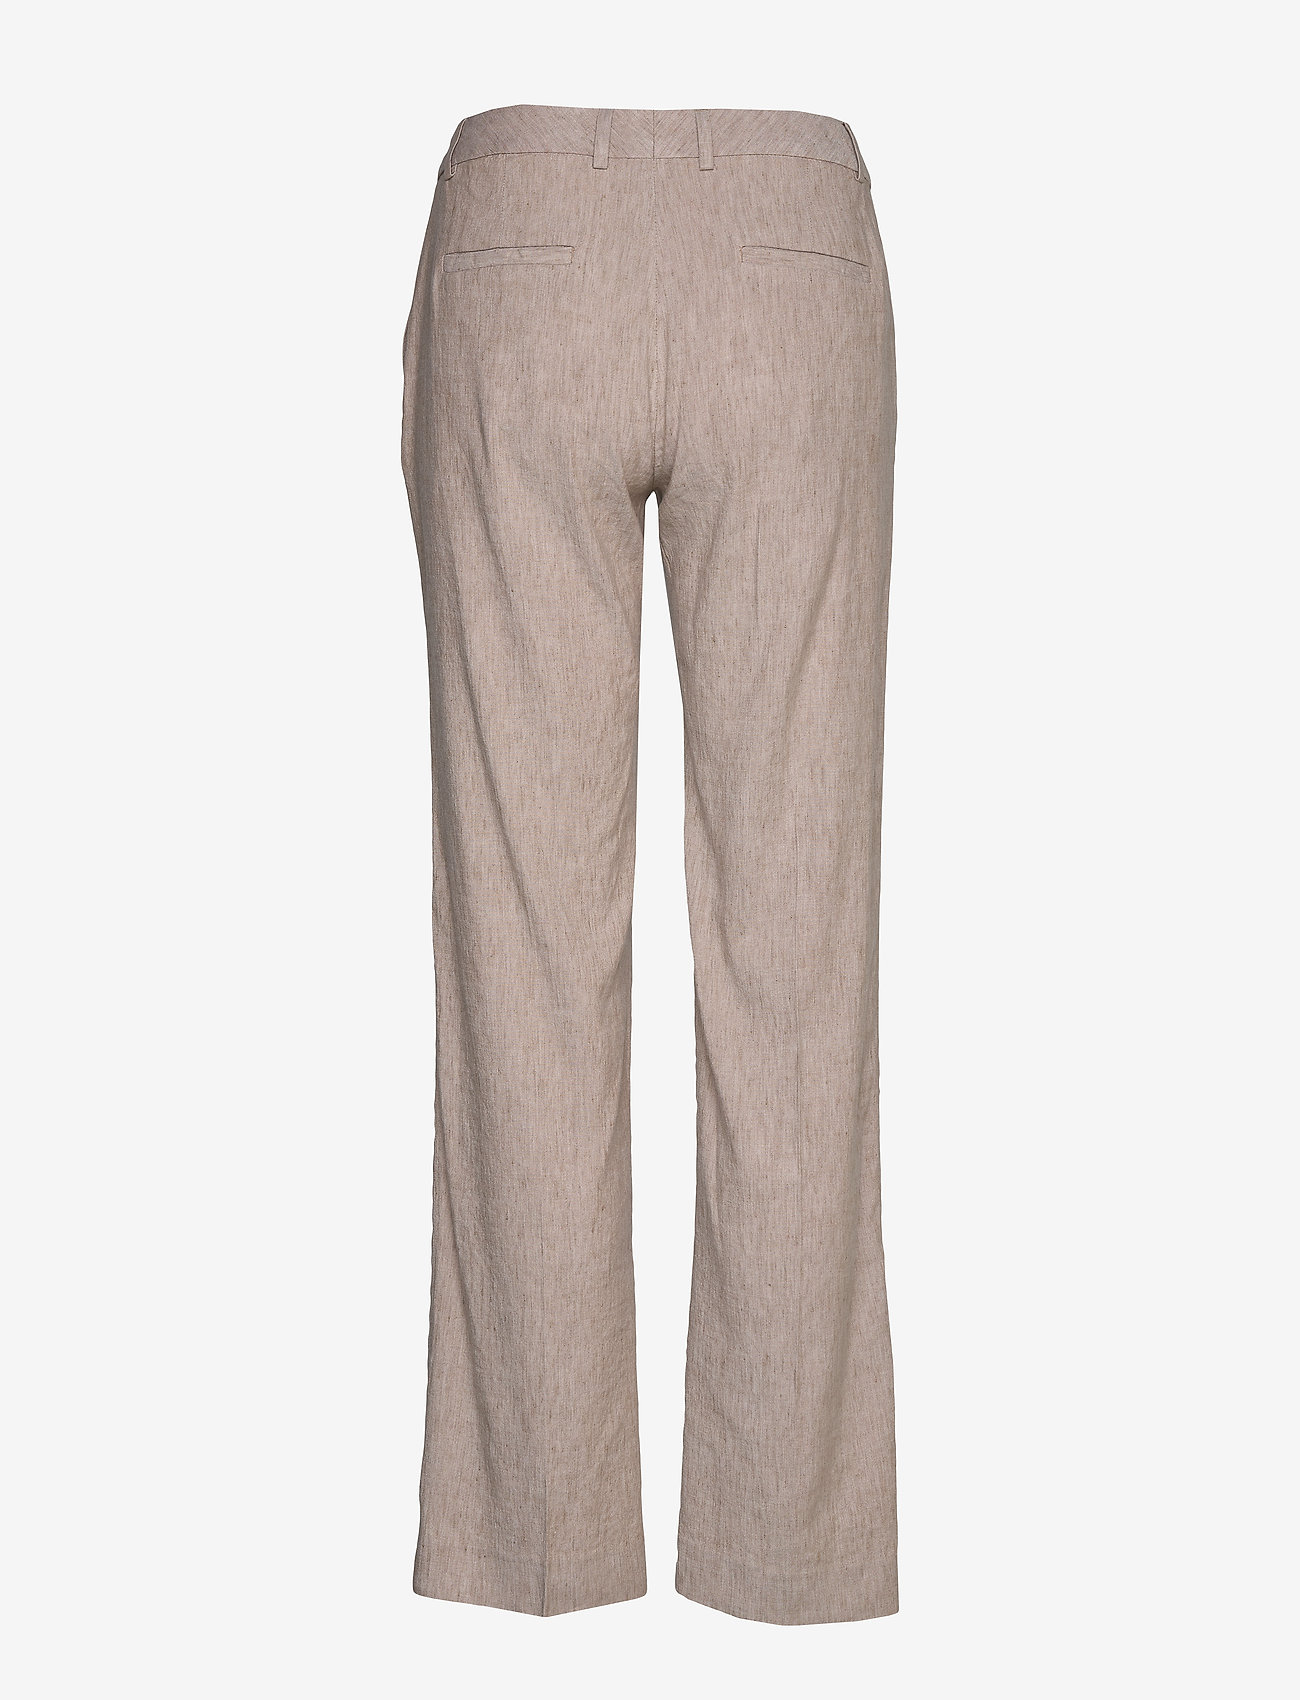 Gant - D2. STRETCH LINEN SLIM SLOUCH PANT - pantalons droits - dark khaki